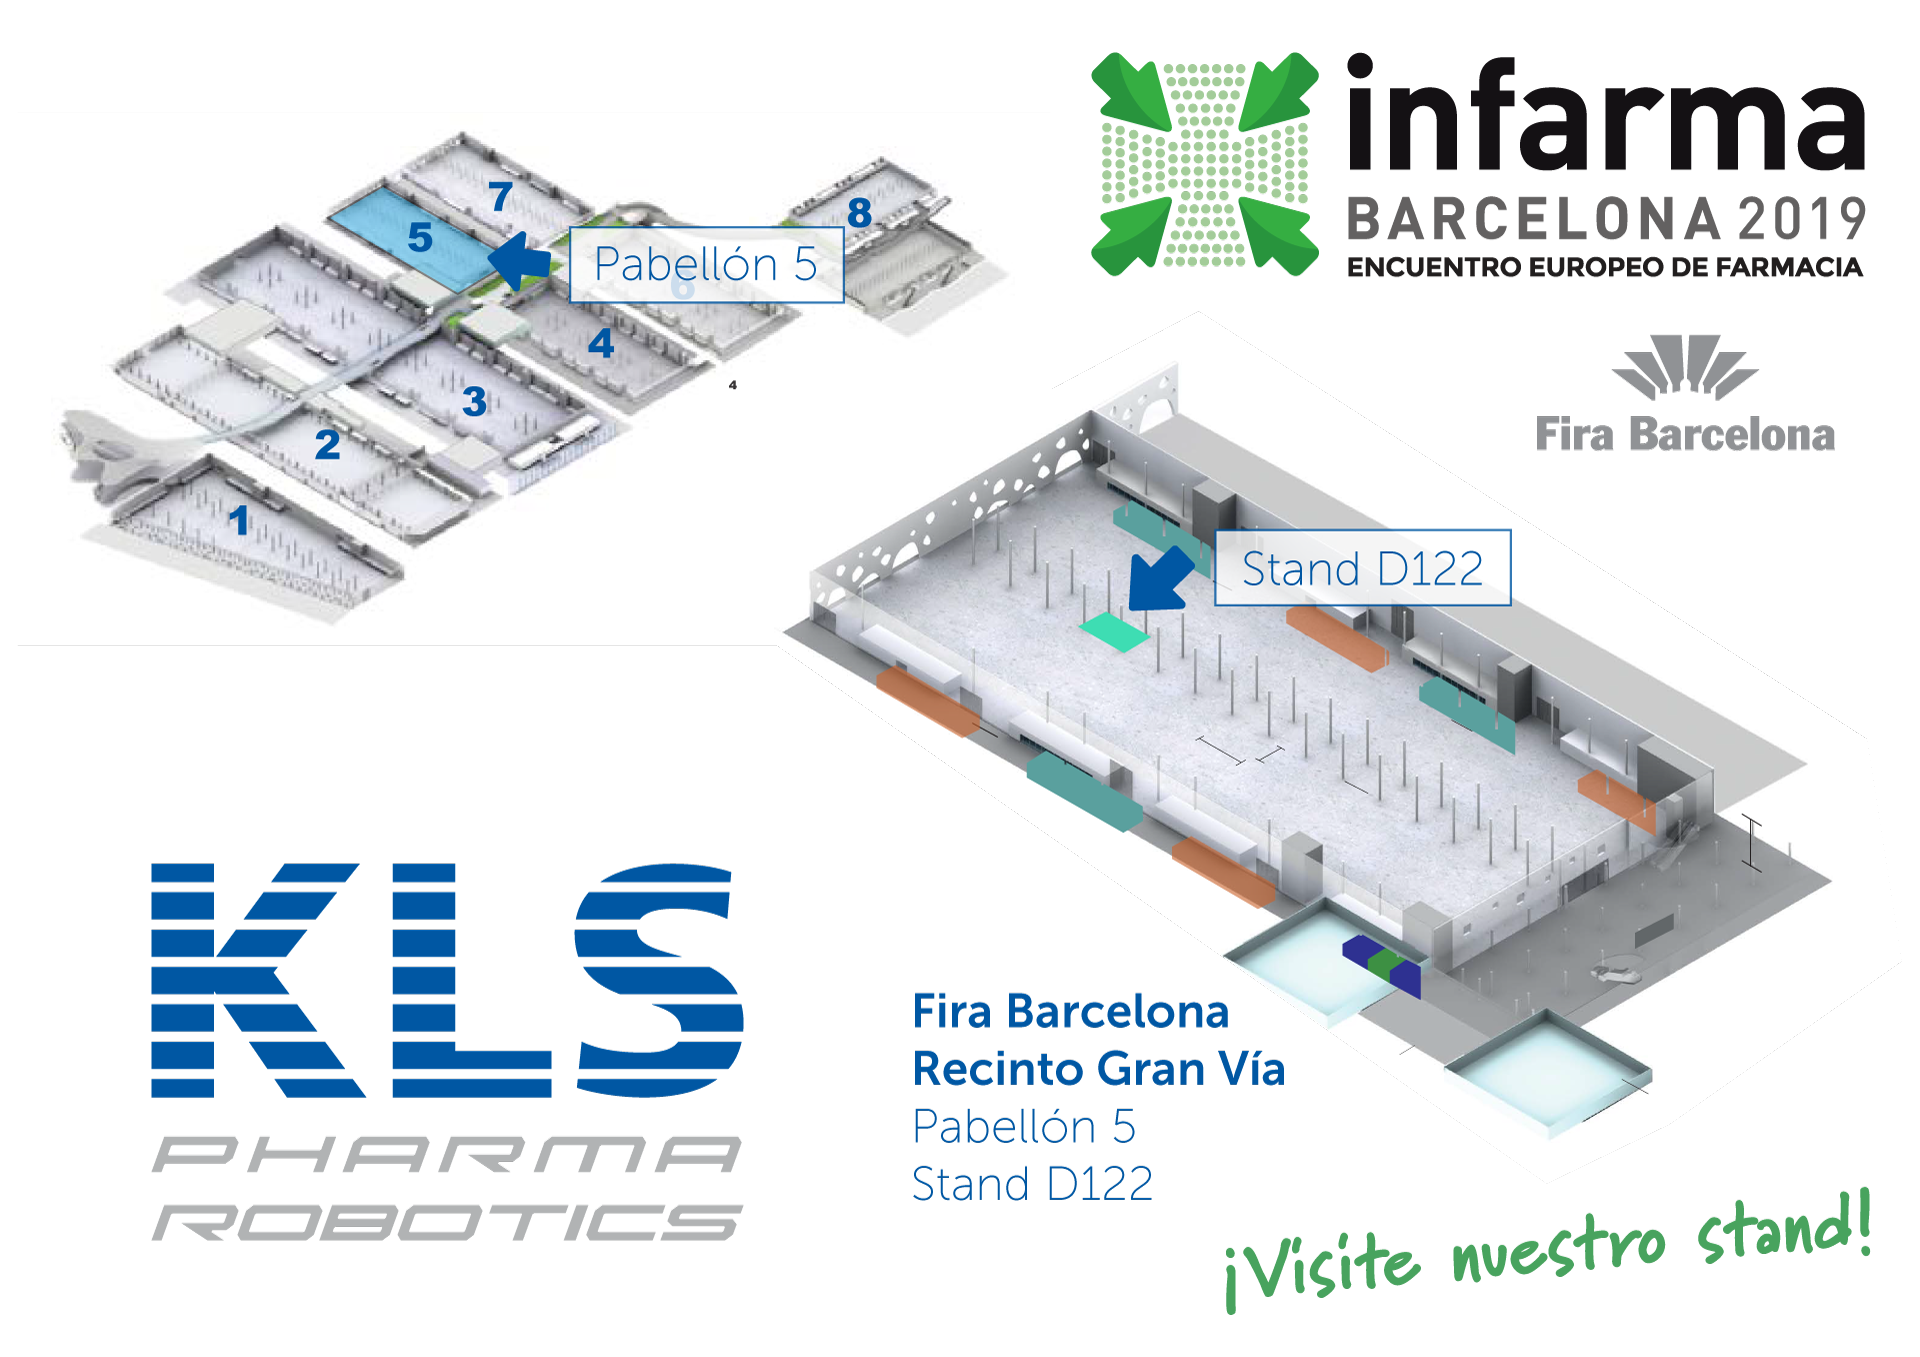 Stand KLS Pharma Robotics en Infarma Barcelona 2017